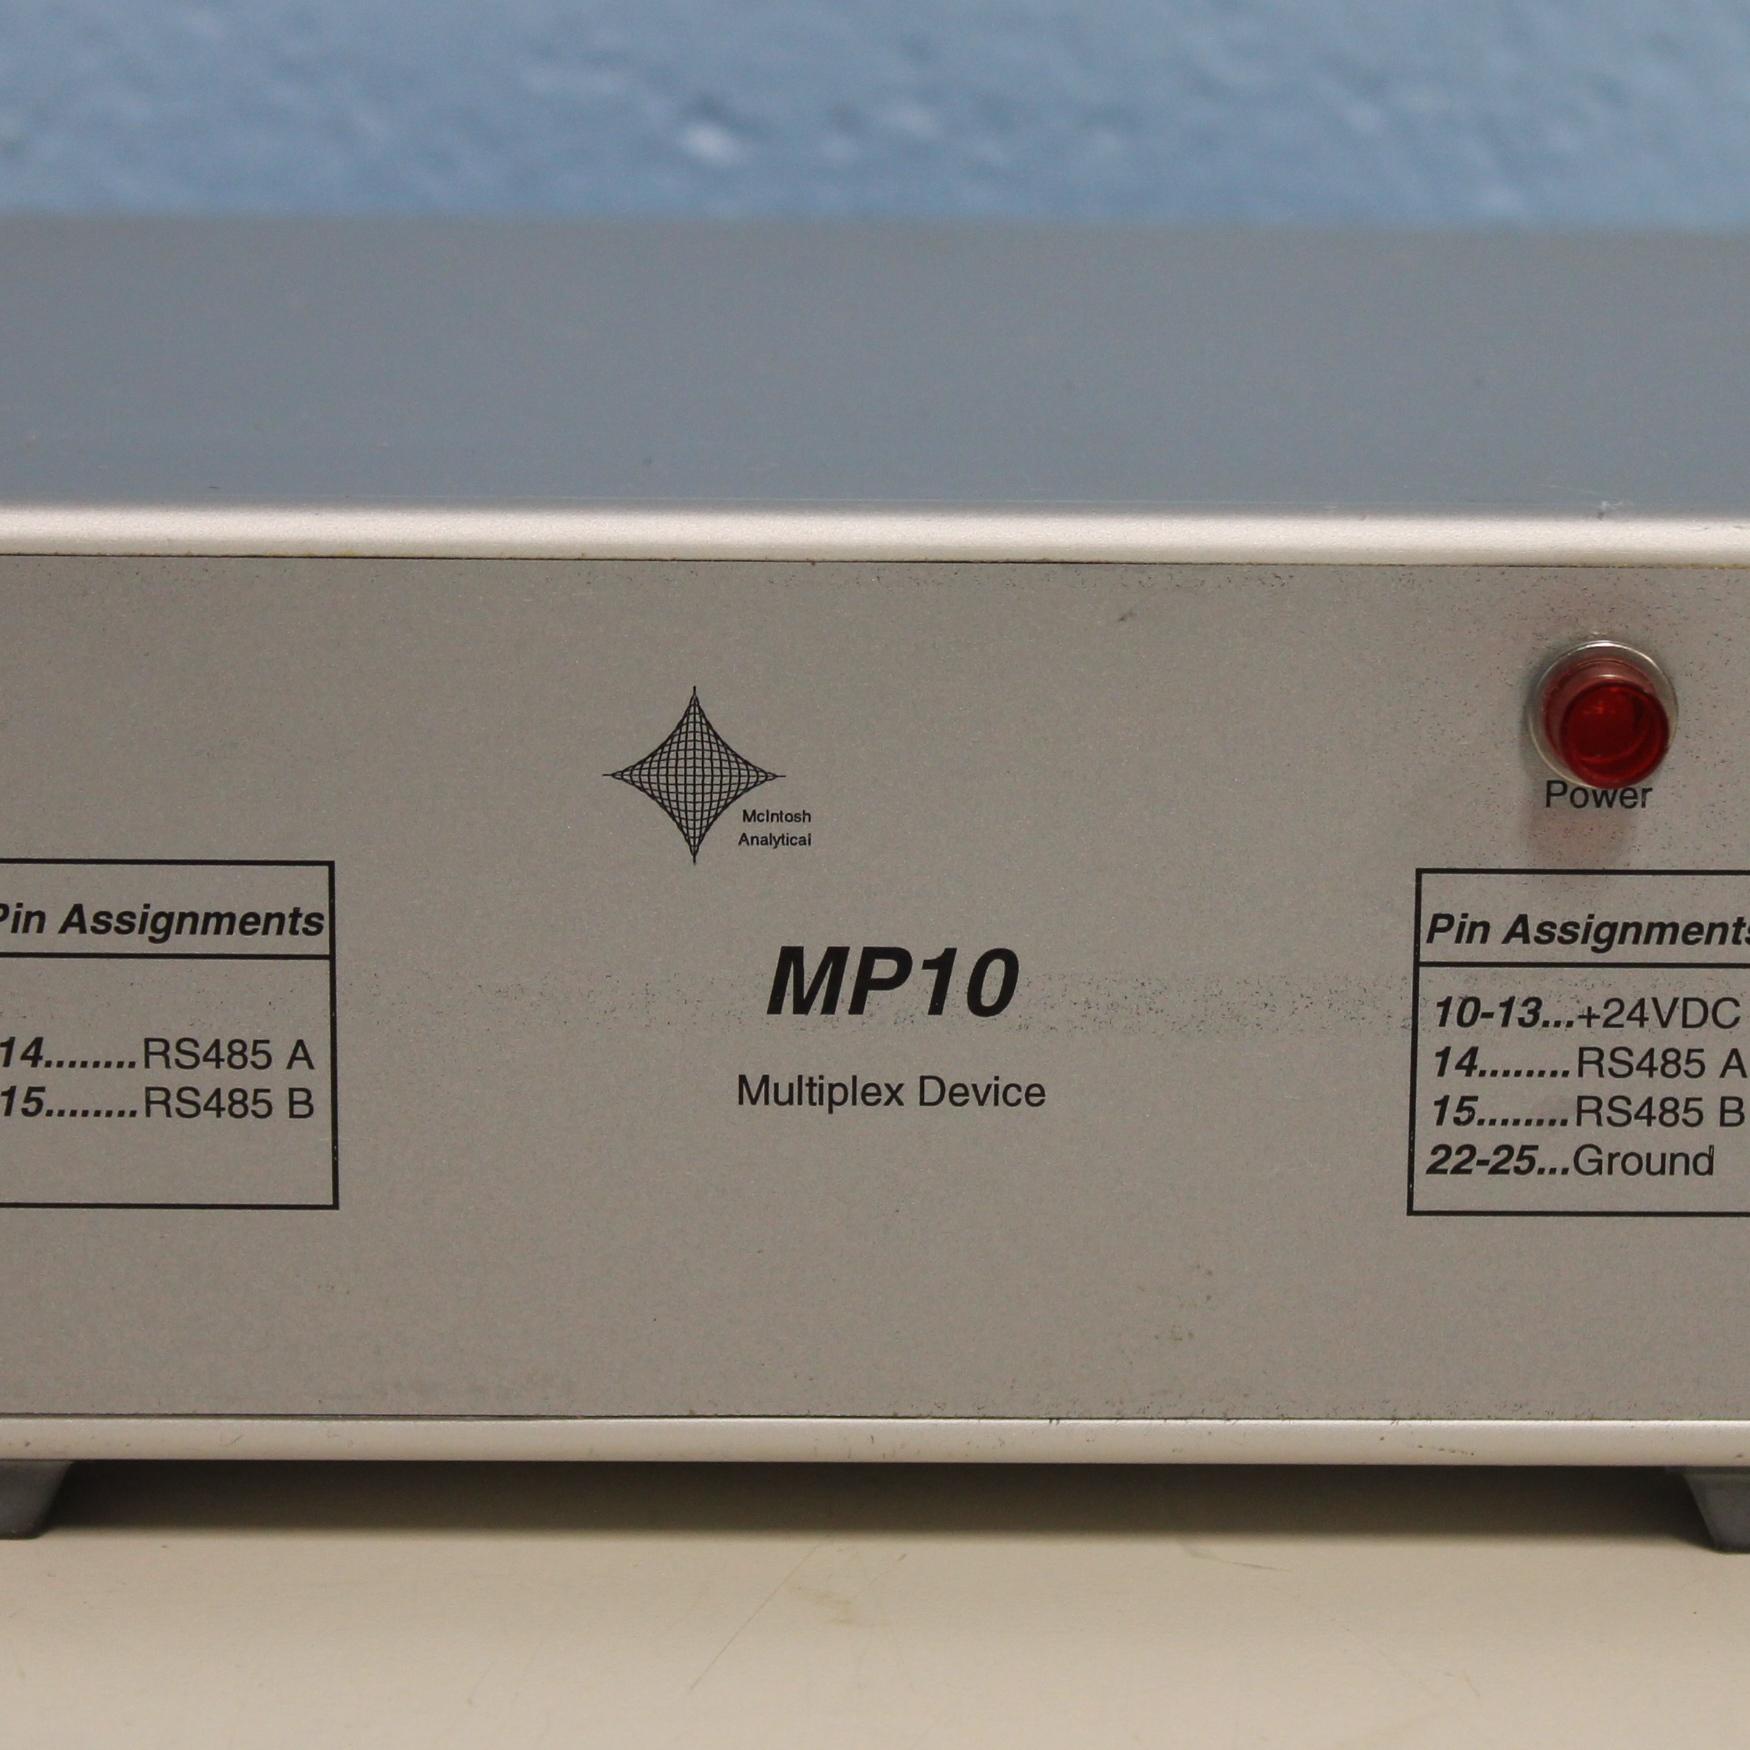 Macintosh Cavro XL Multiplexon Image